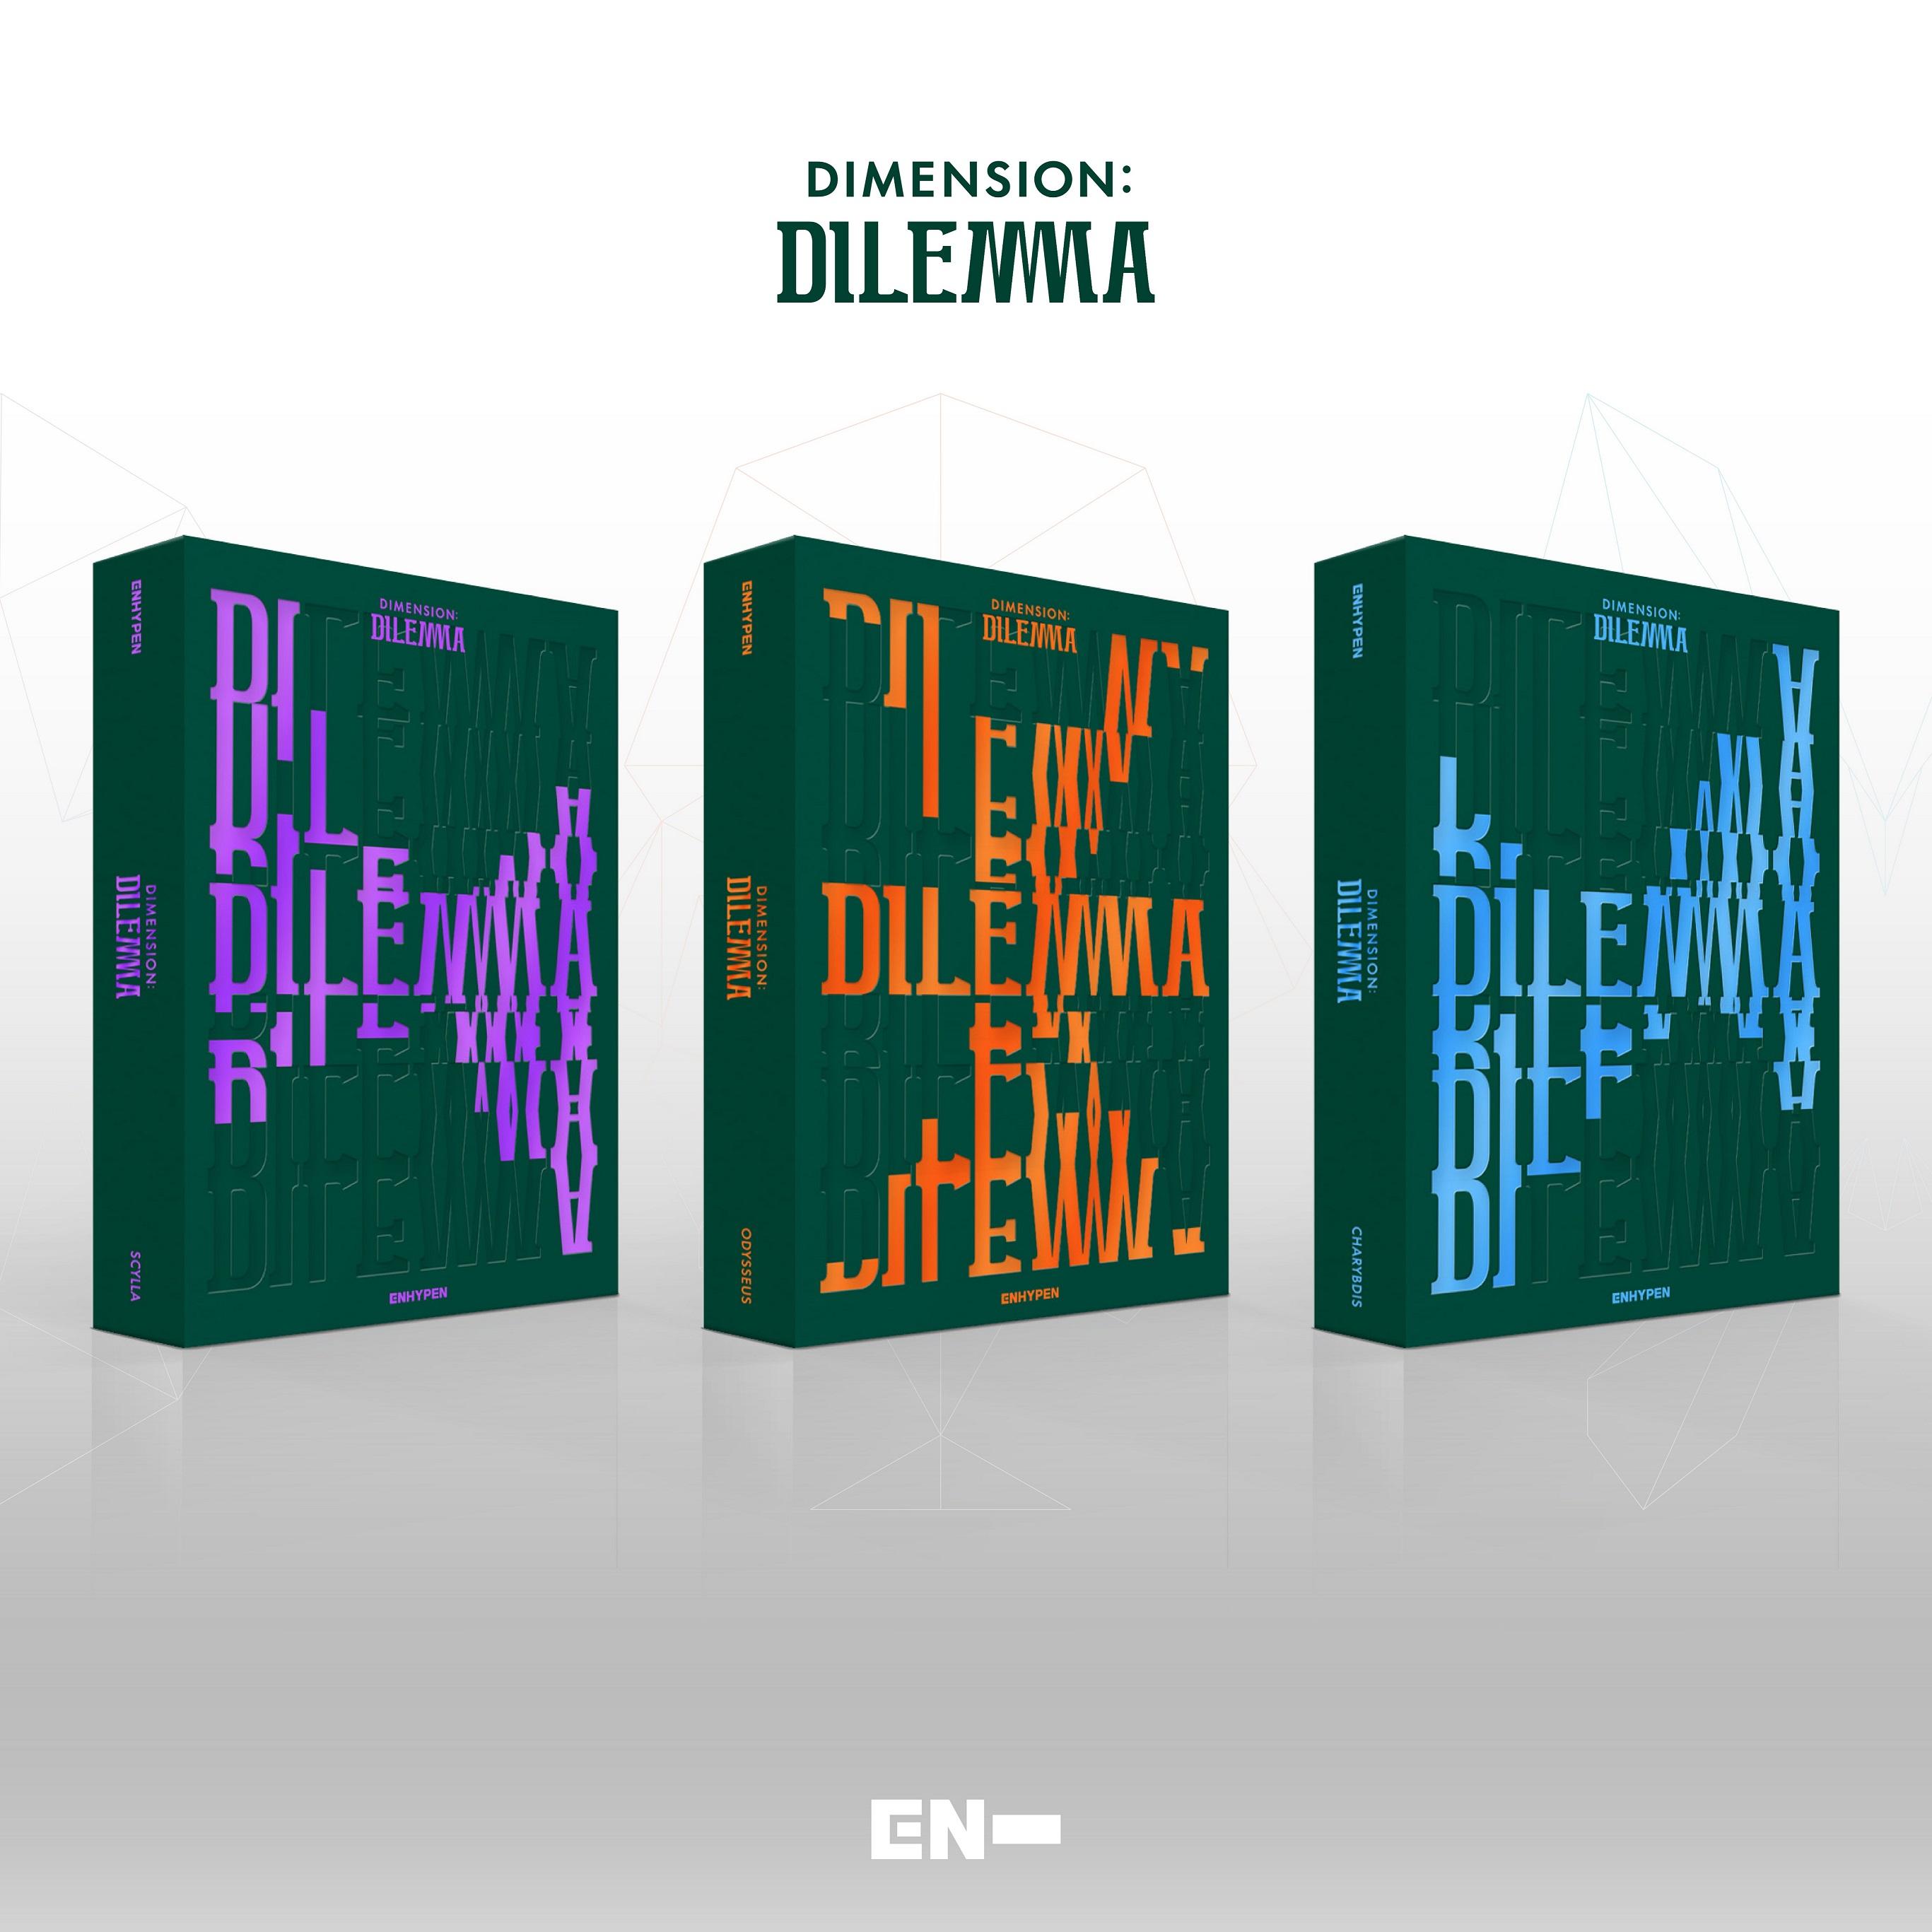 DILEMMA_album_0824_2